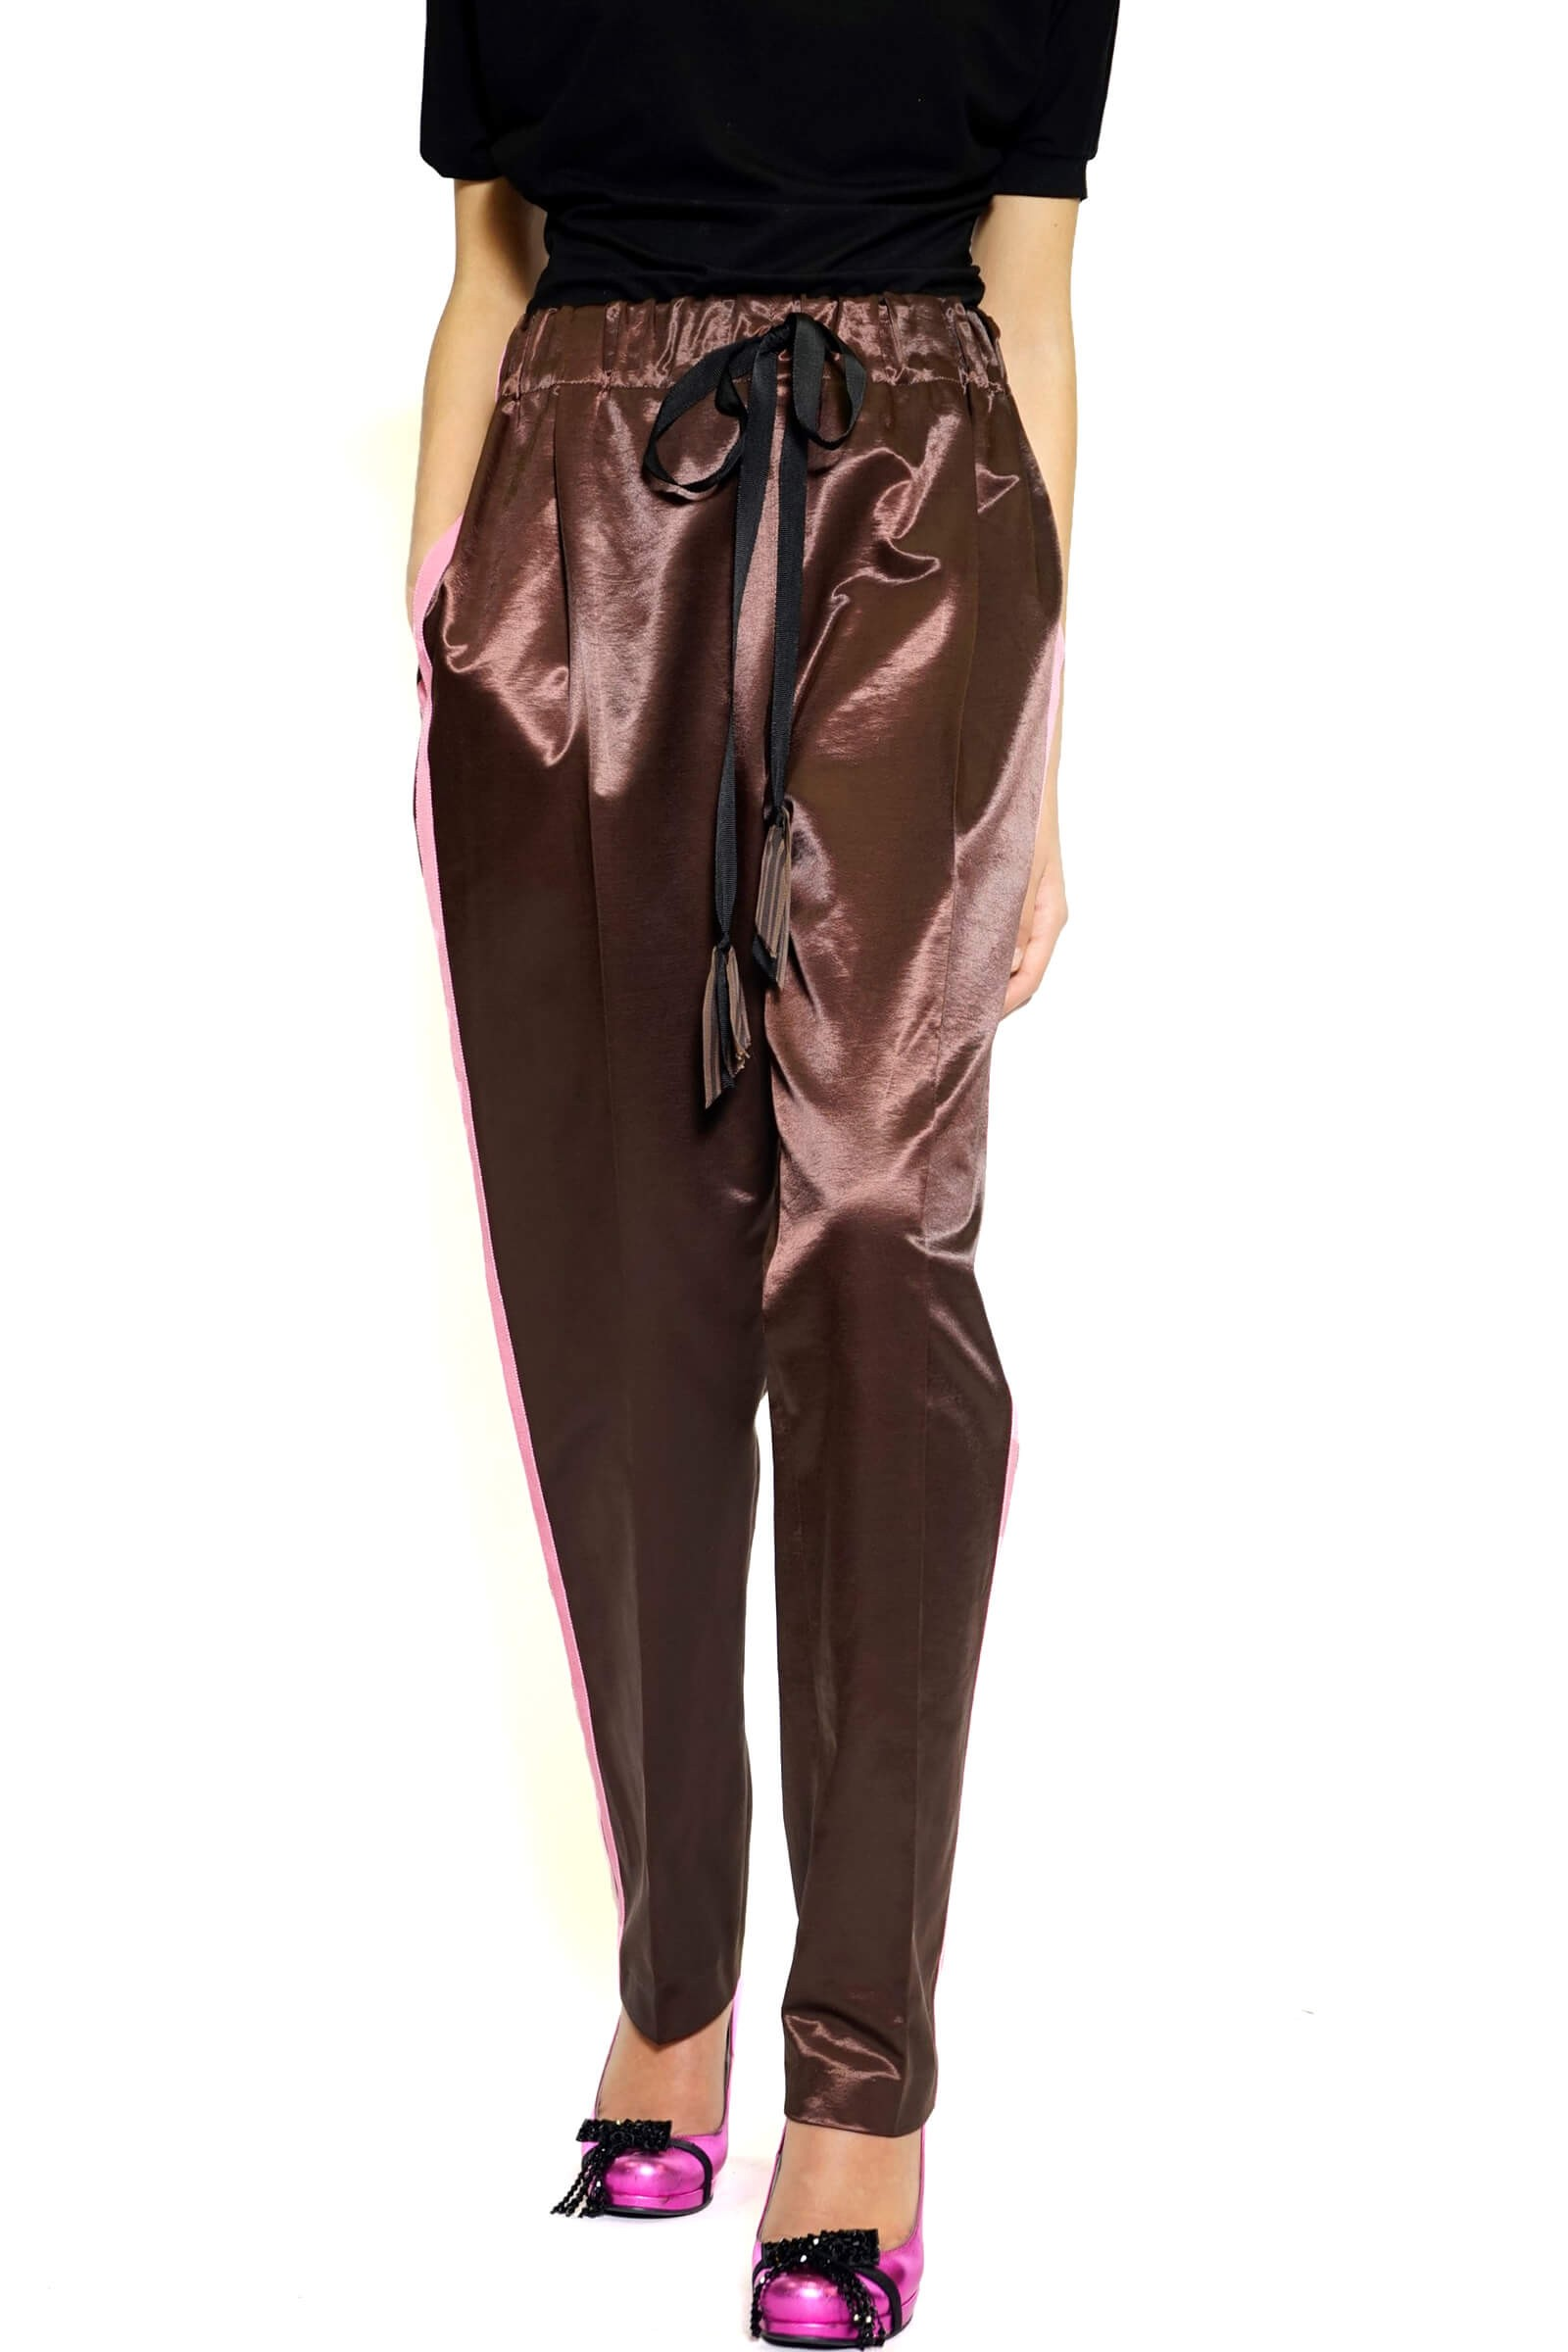 Pants with an elastic waist